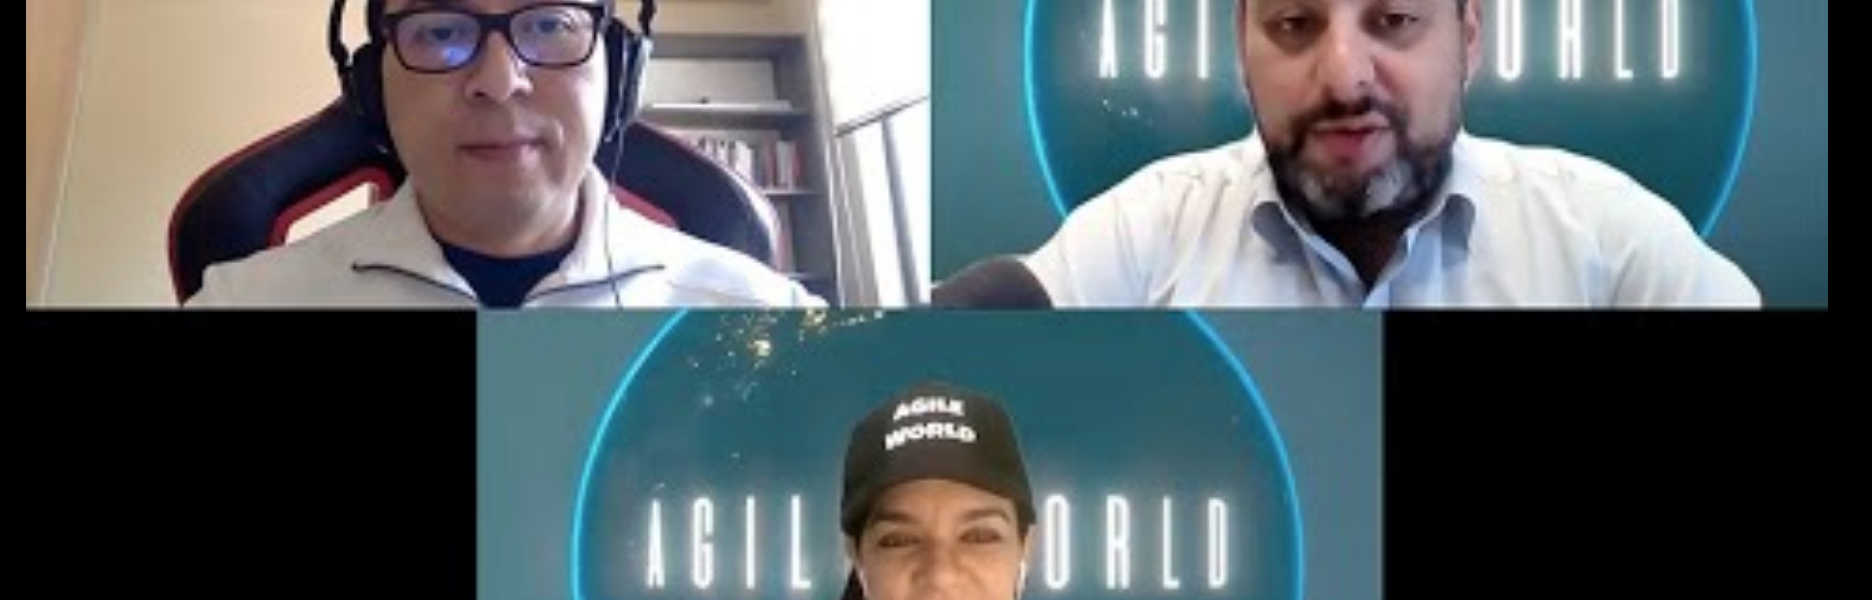 Adaptativo como la vida misma, Agile World en Español Serie 1, Episodio 2